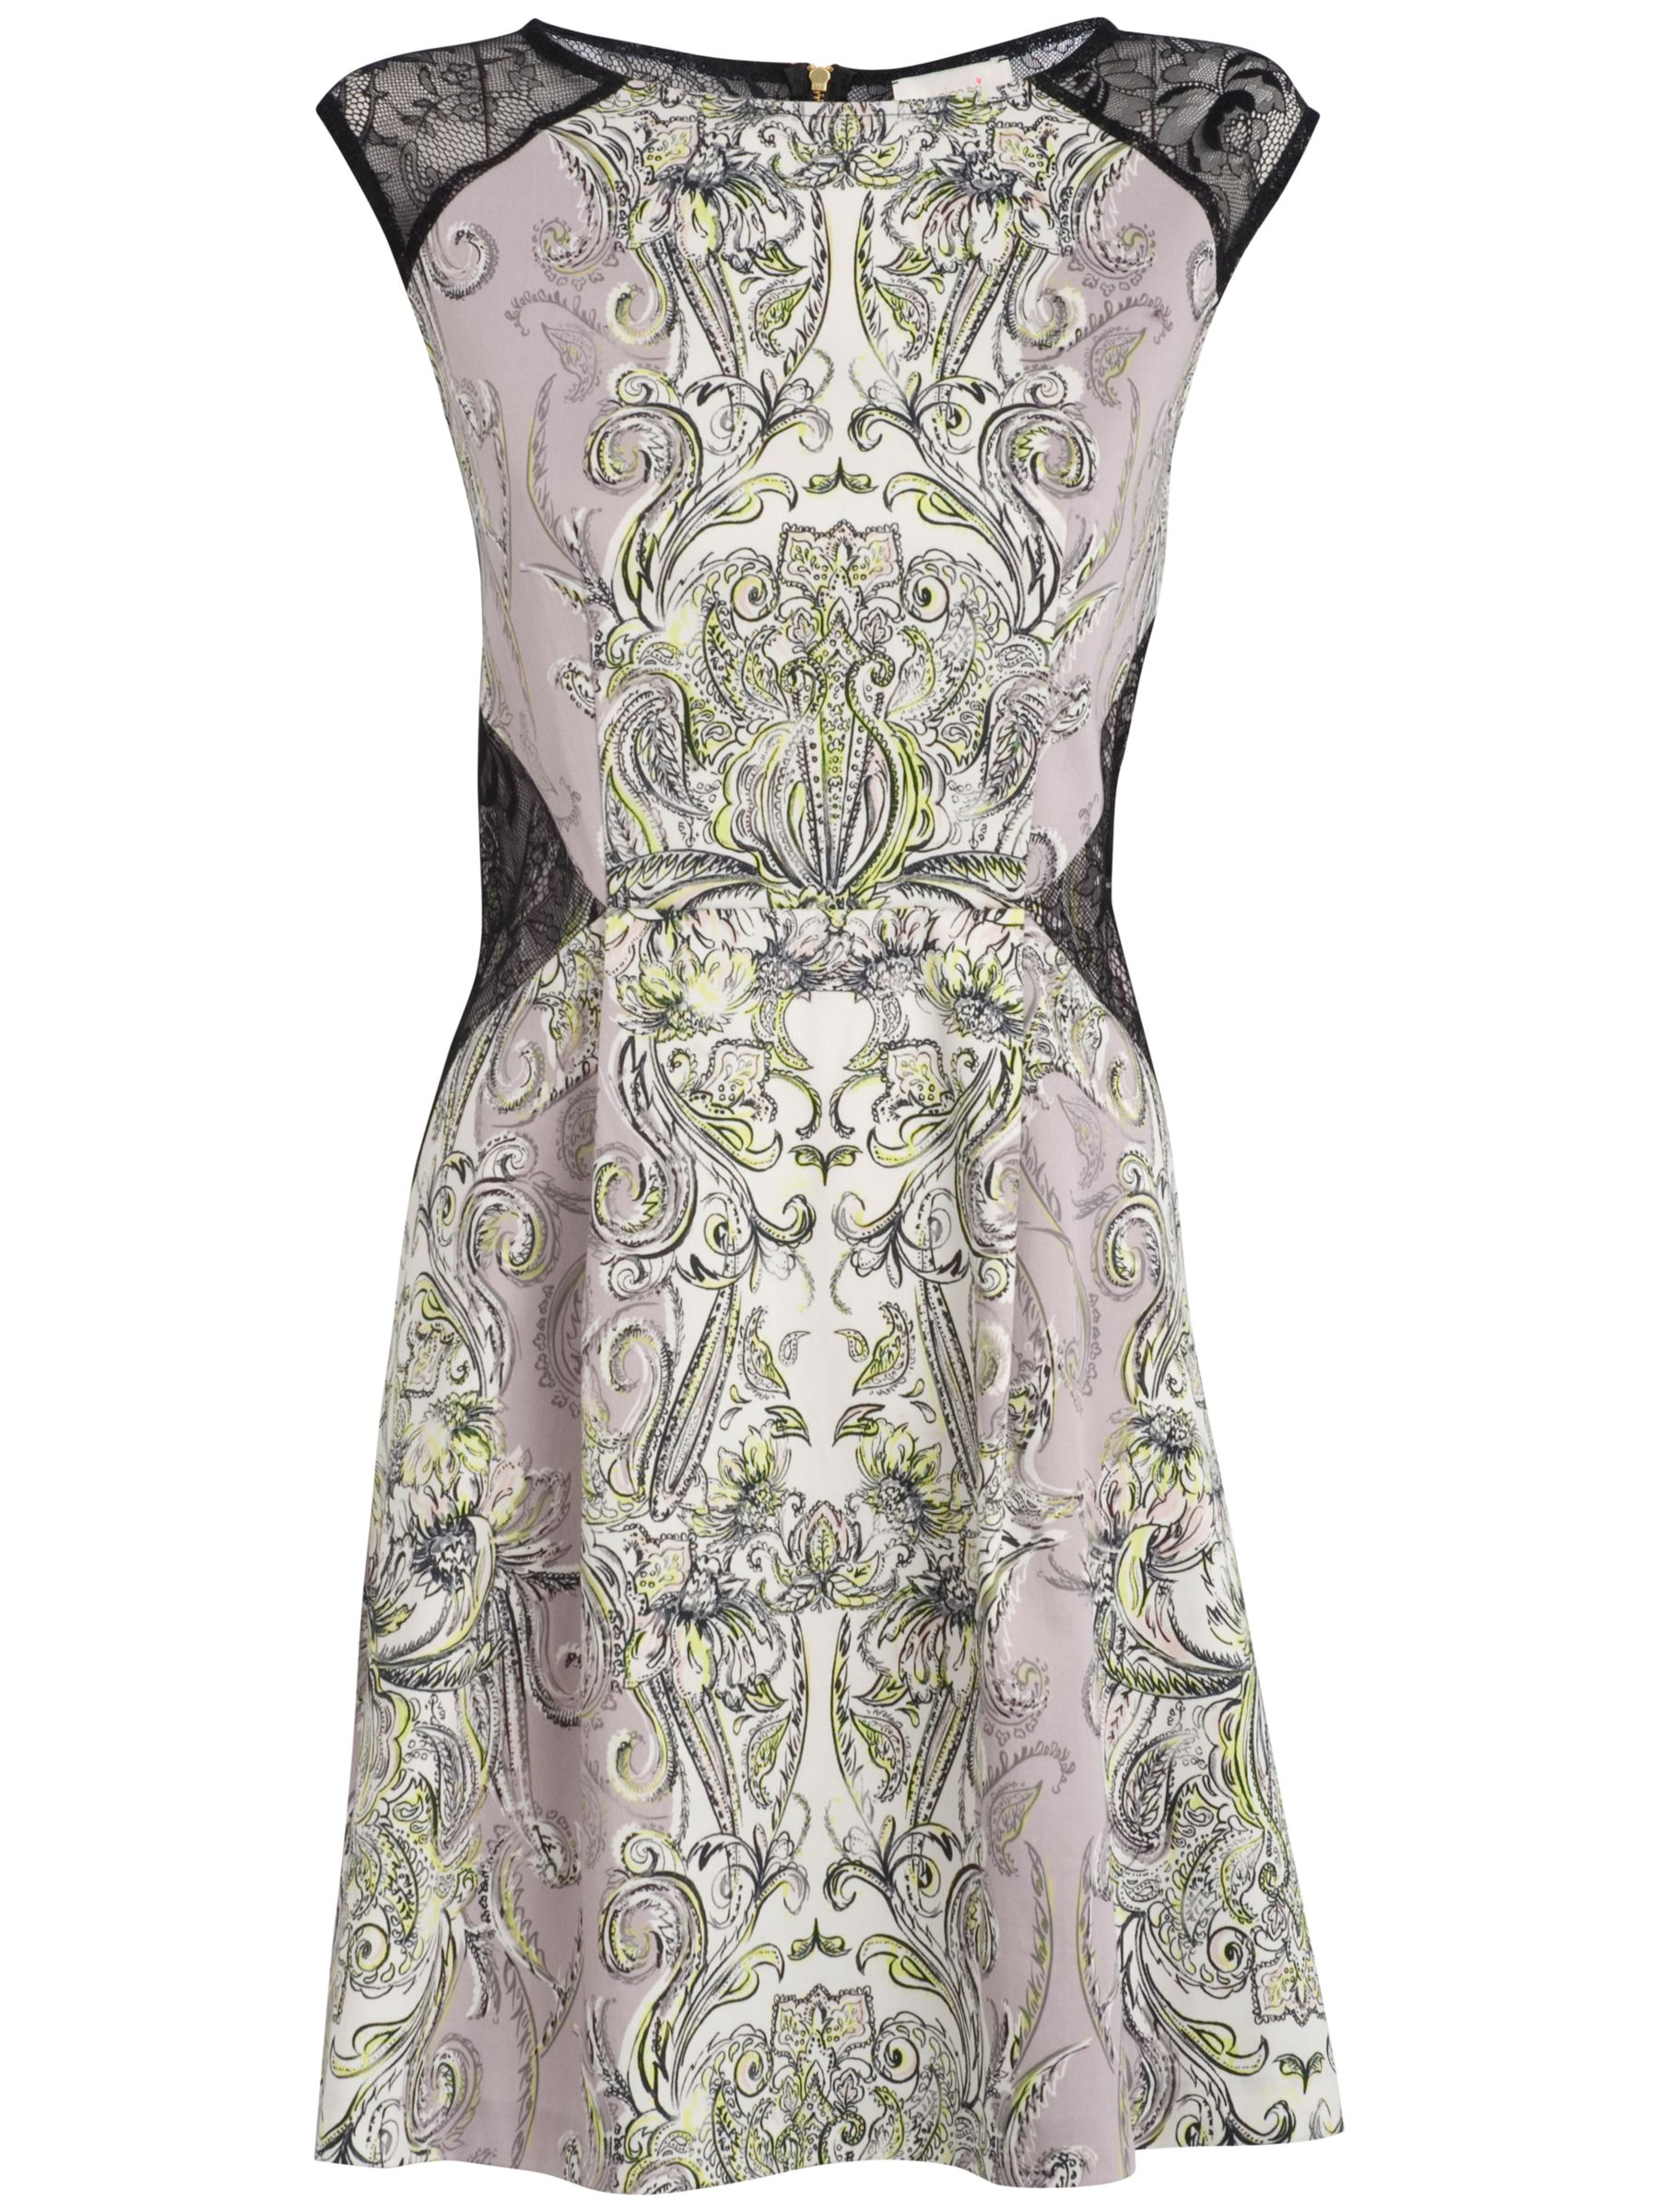 almari lace & paisley dress lilac / black, almari, lace, paisley, dress, lilac, black, 8 12 10 14, women, womens dresses, special offers, womenswear offers, womens dresses offers, 707220